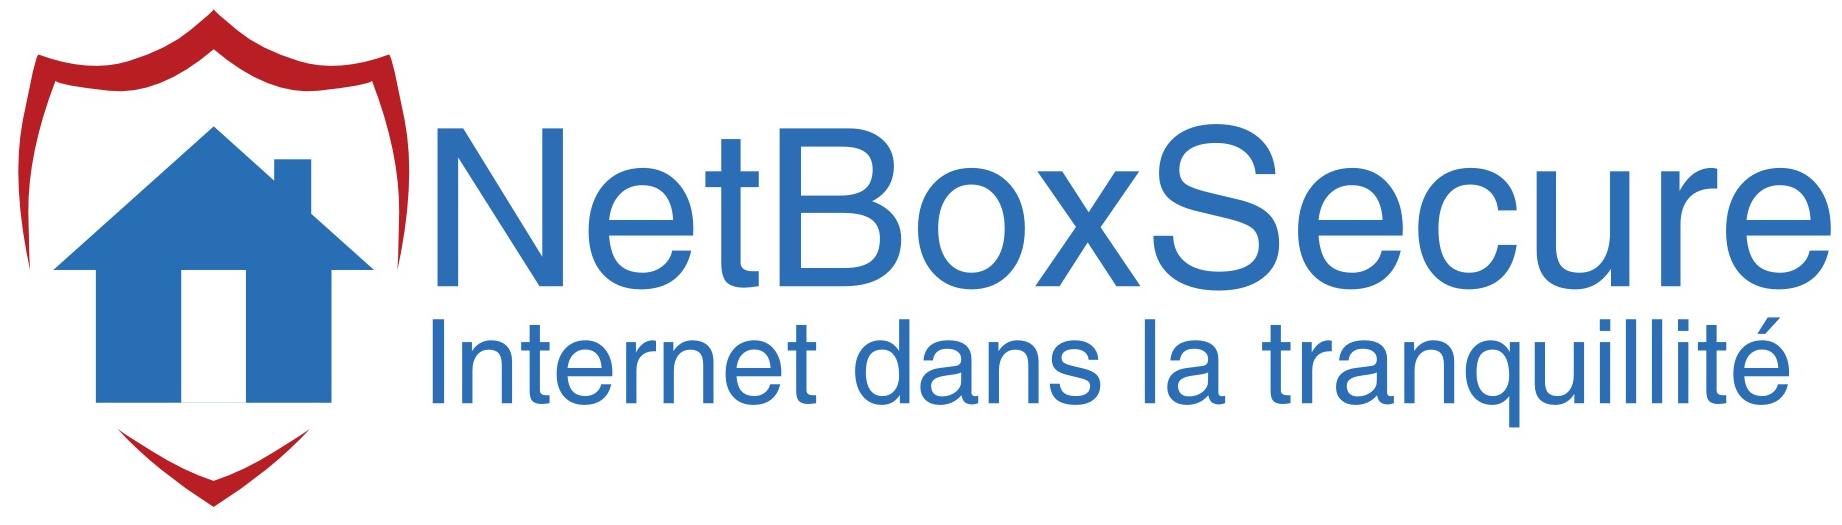 logo NetBoxSecure